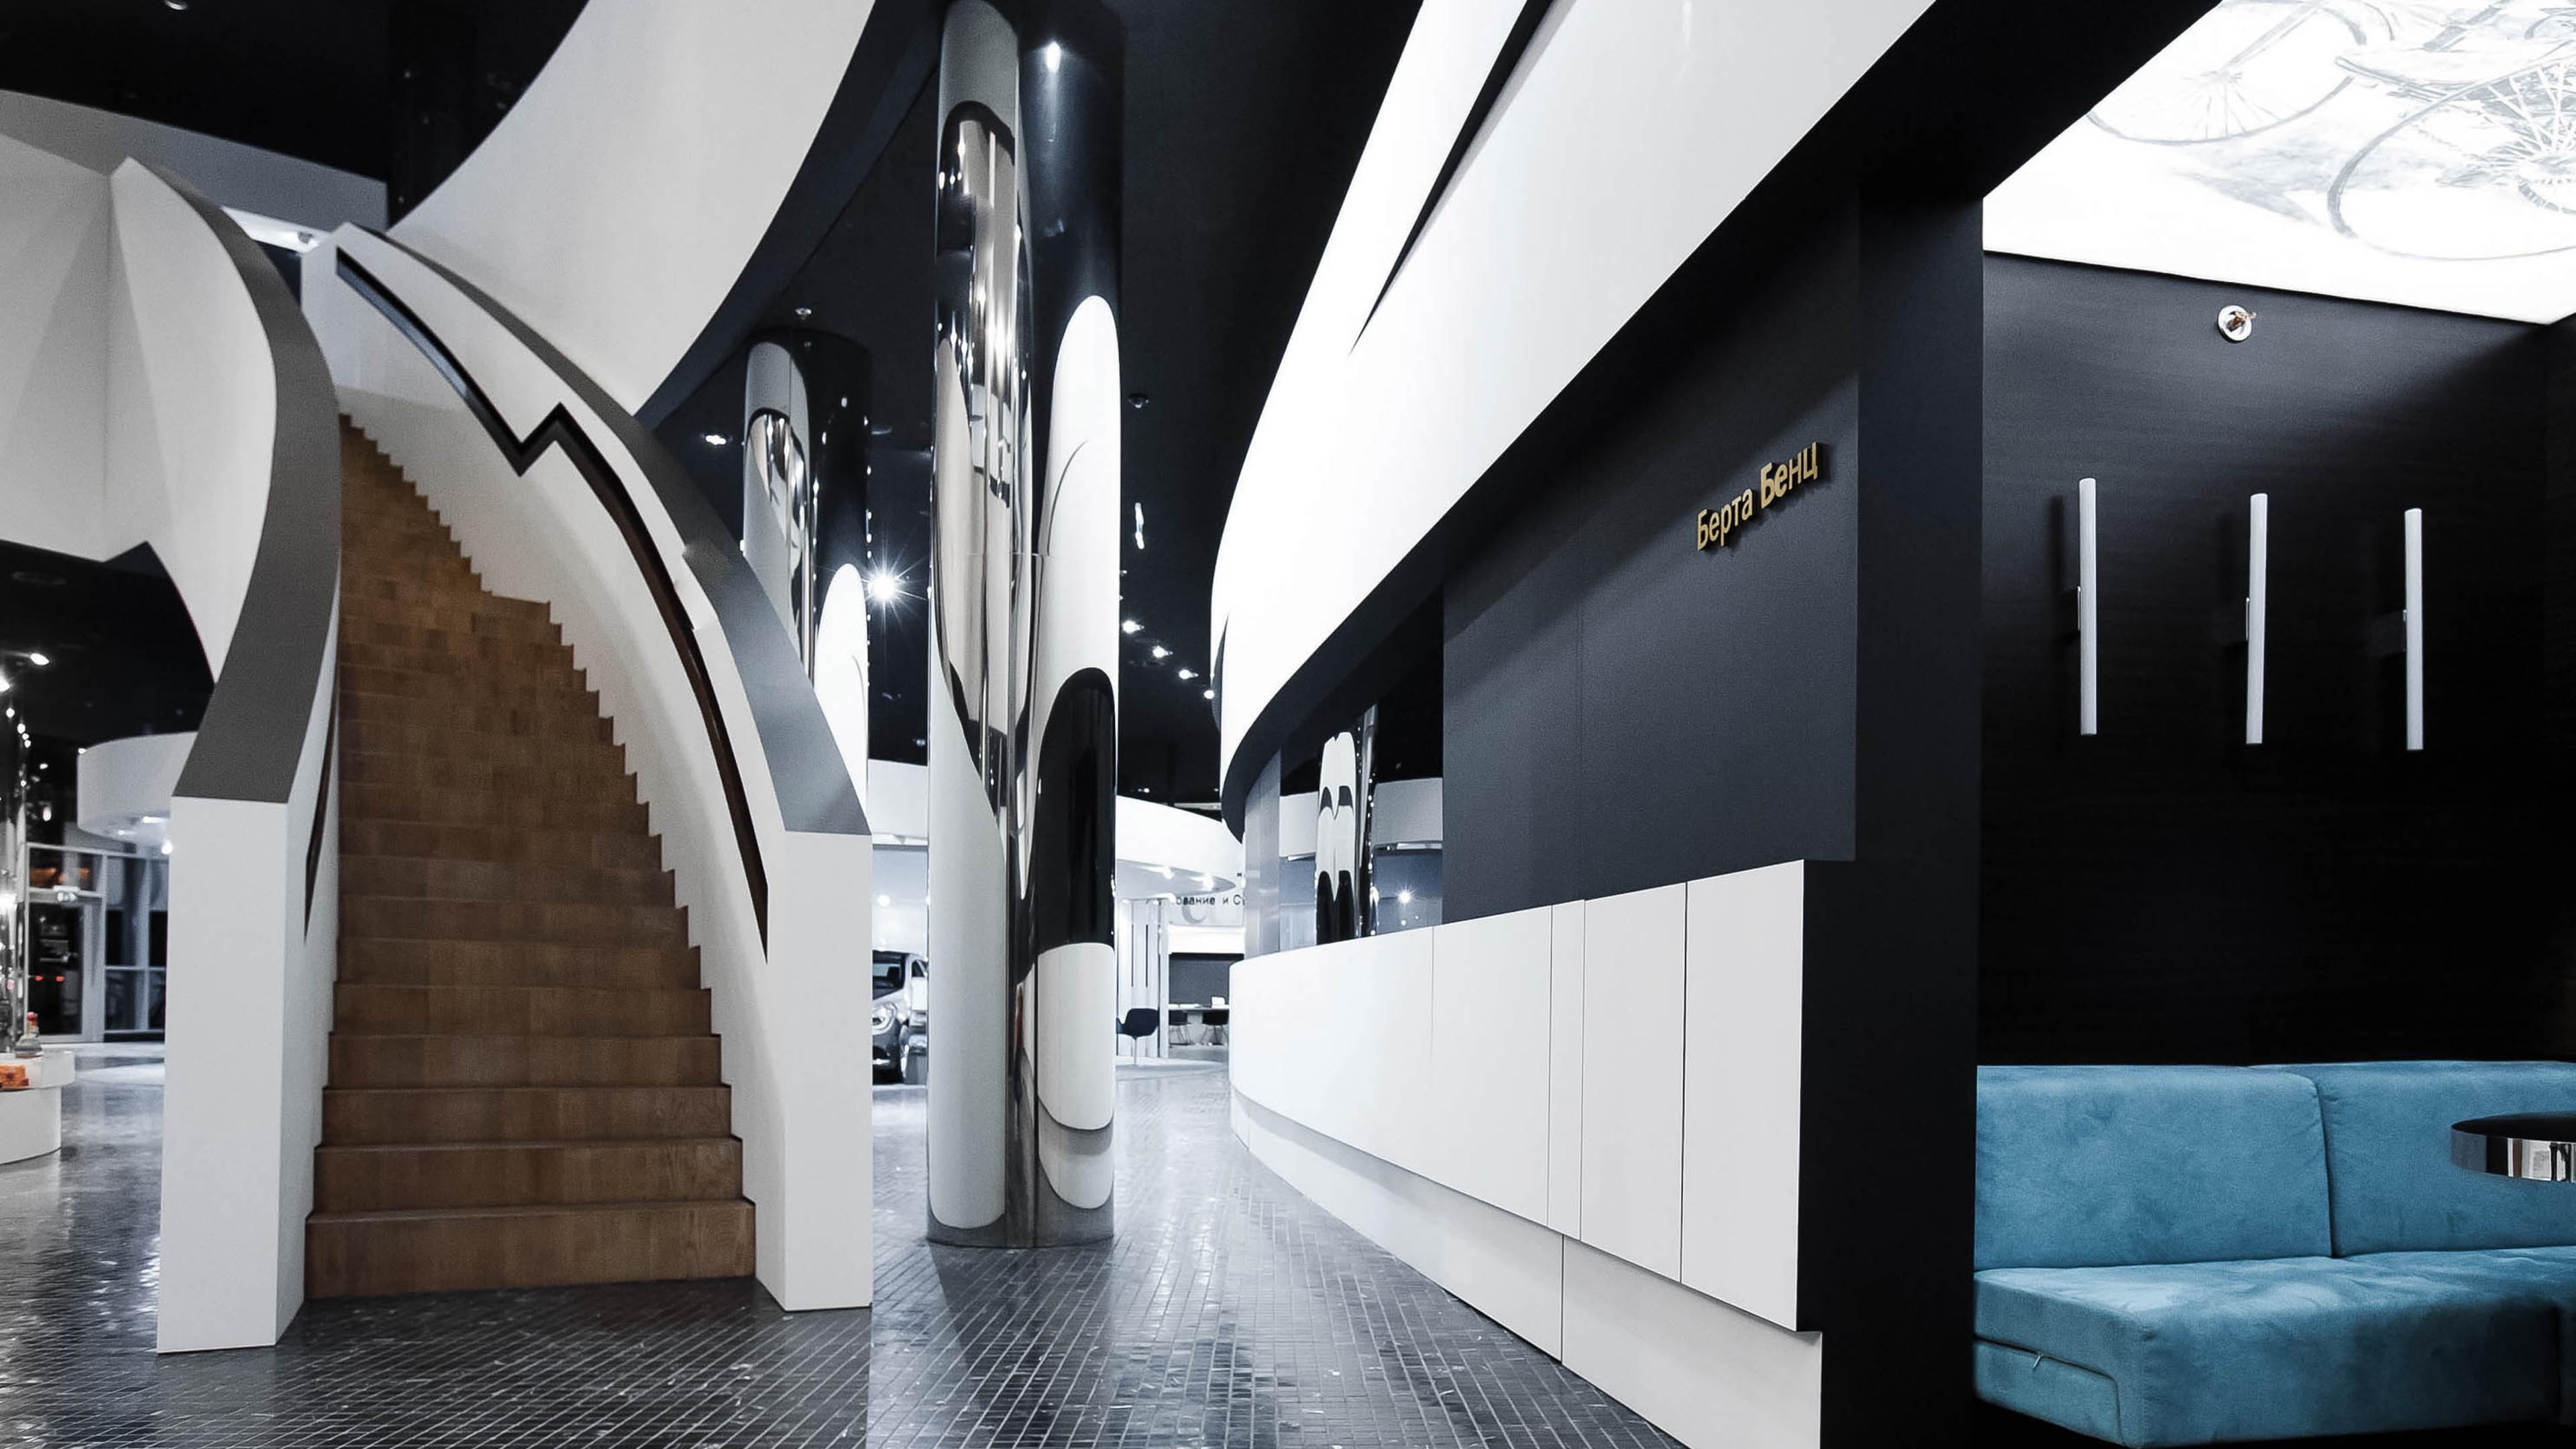 retail store canada mercedes content me space codec exterior david benz img partner taylor introduces